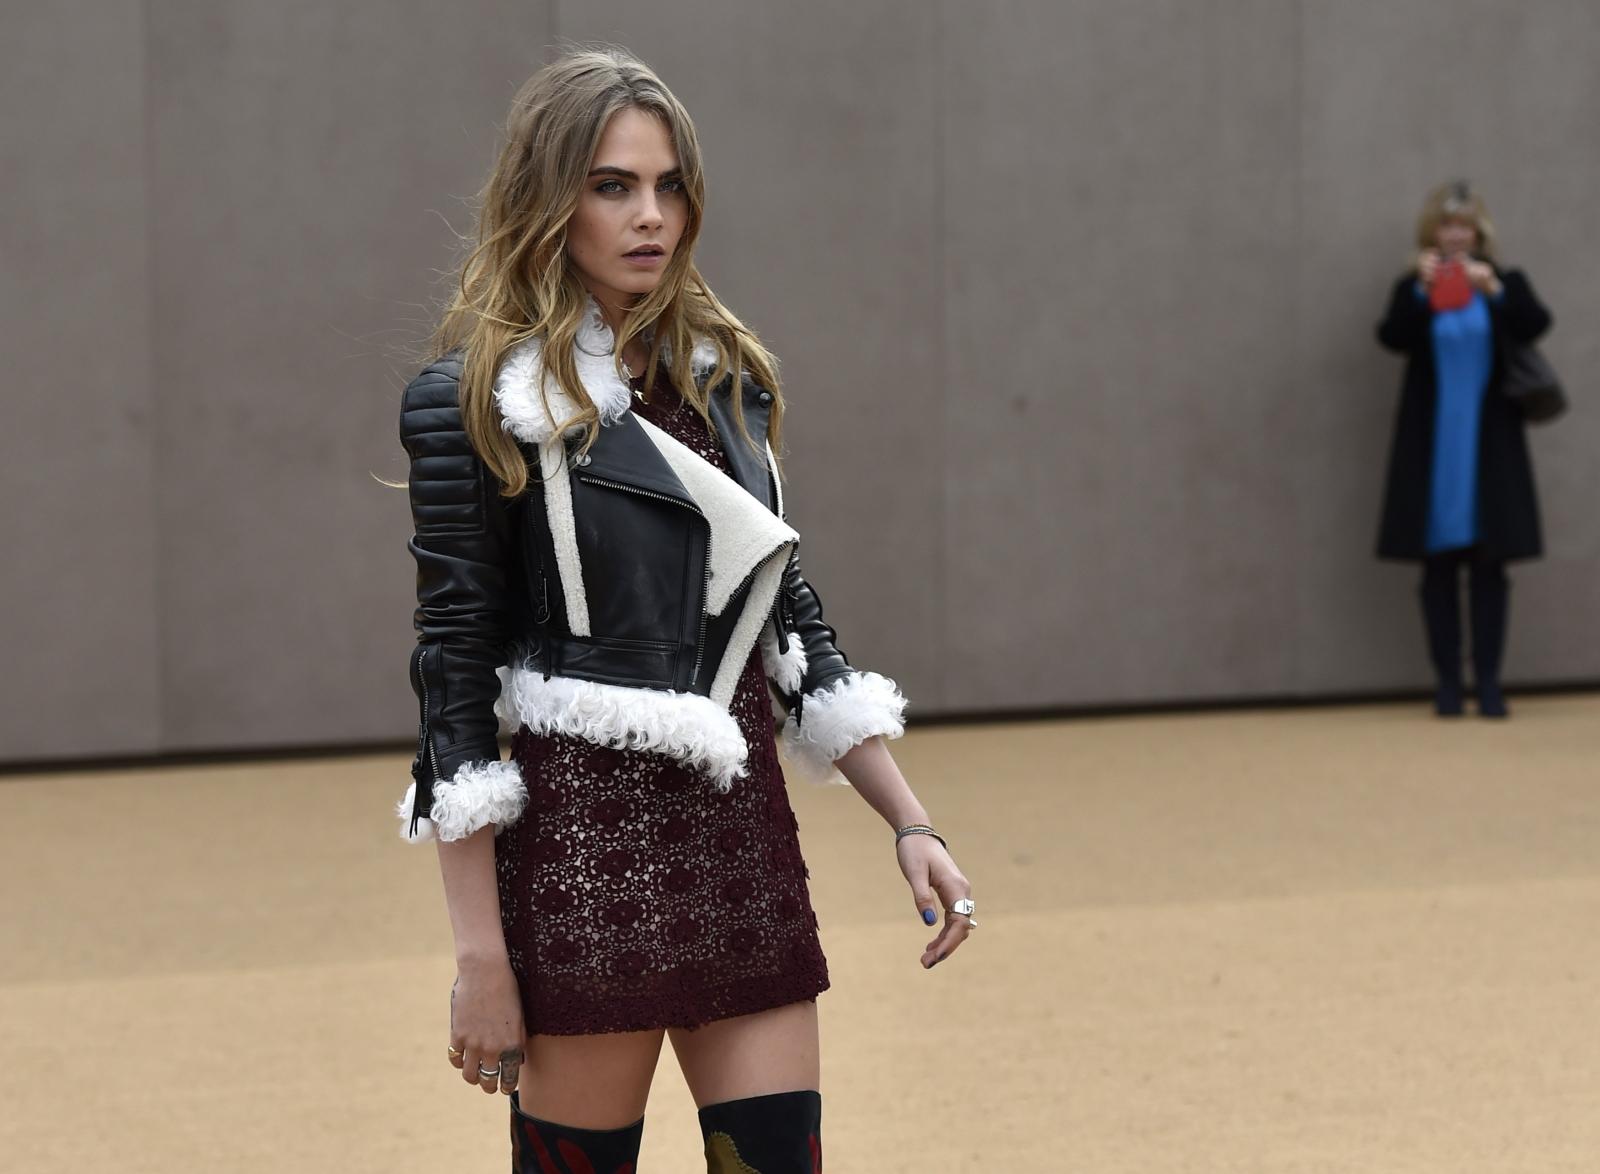 London Fashion Week 2015: Burberry takes inspiration from British folk craft